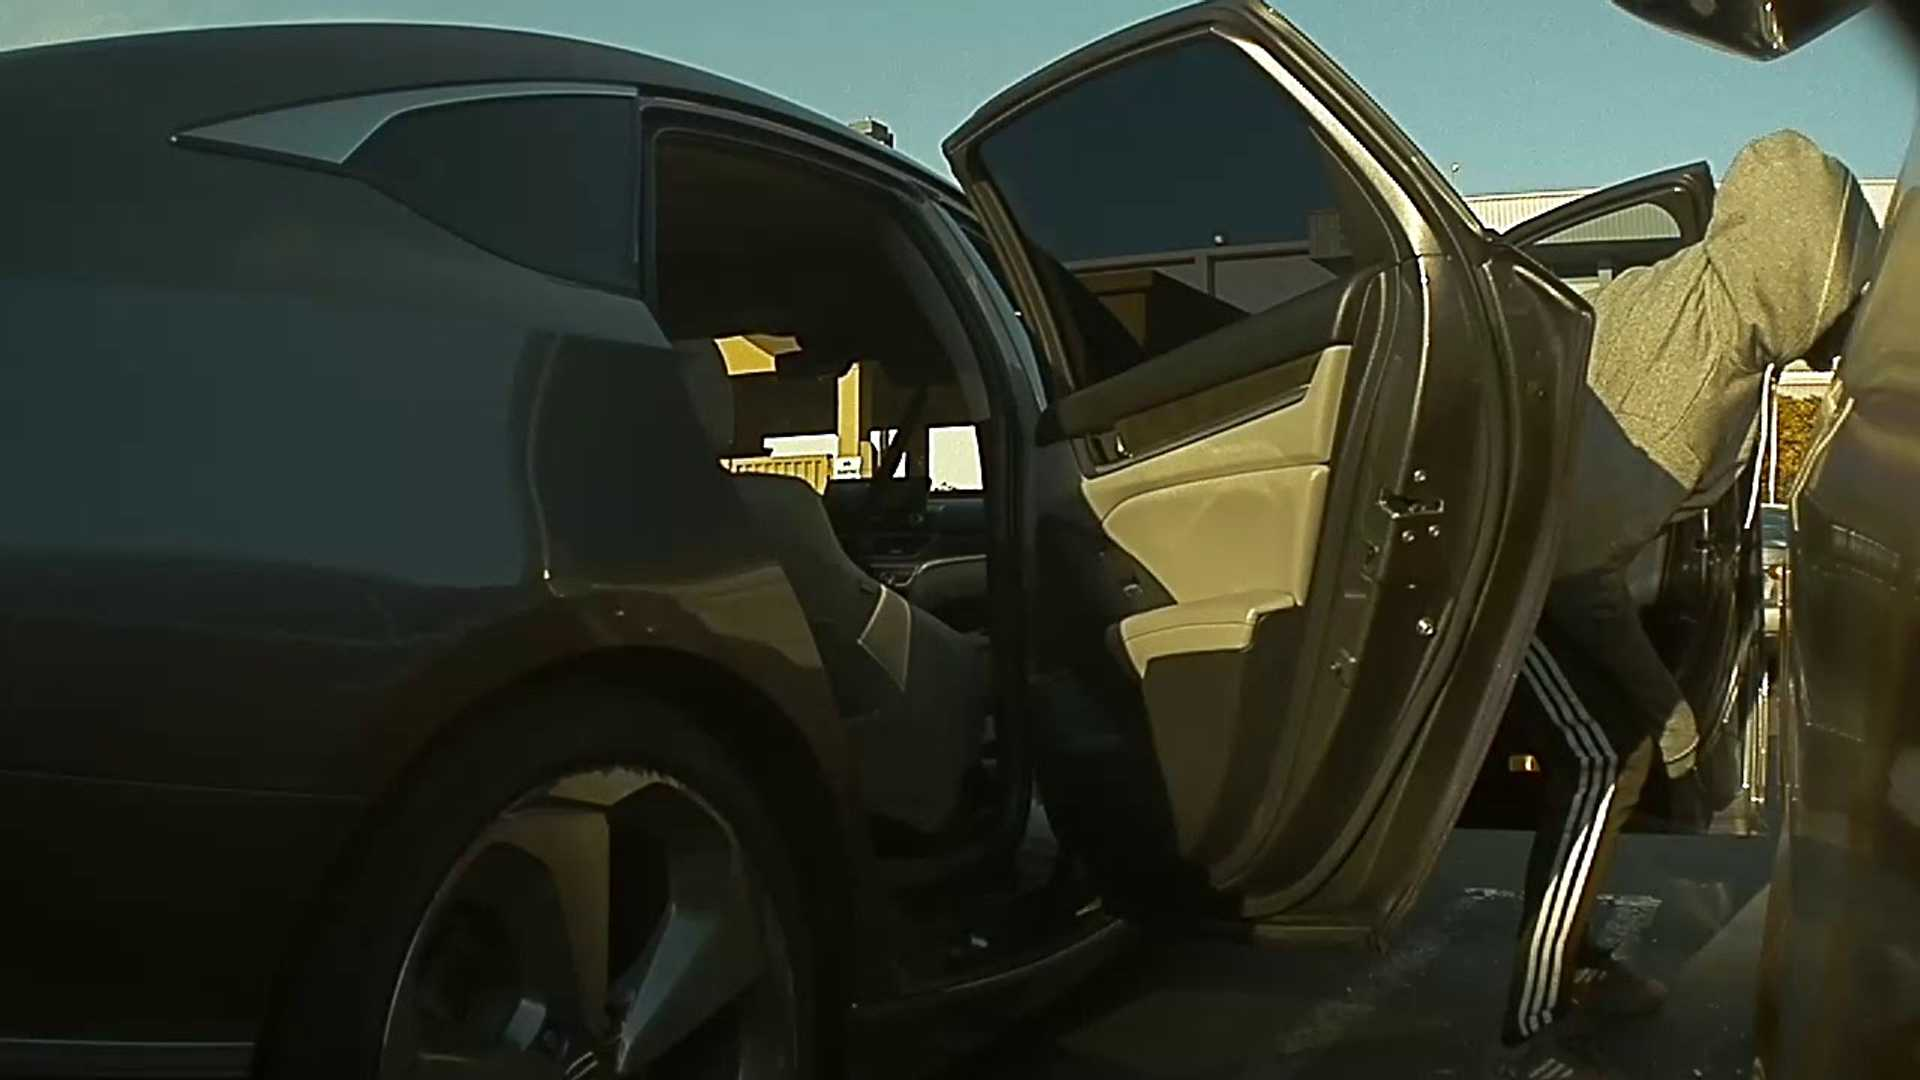 Tesla Cameras Catch Model 3 Break In & Burglary: Video